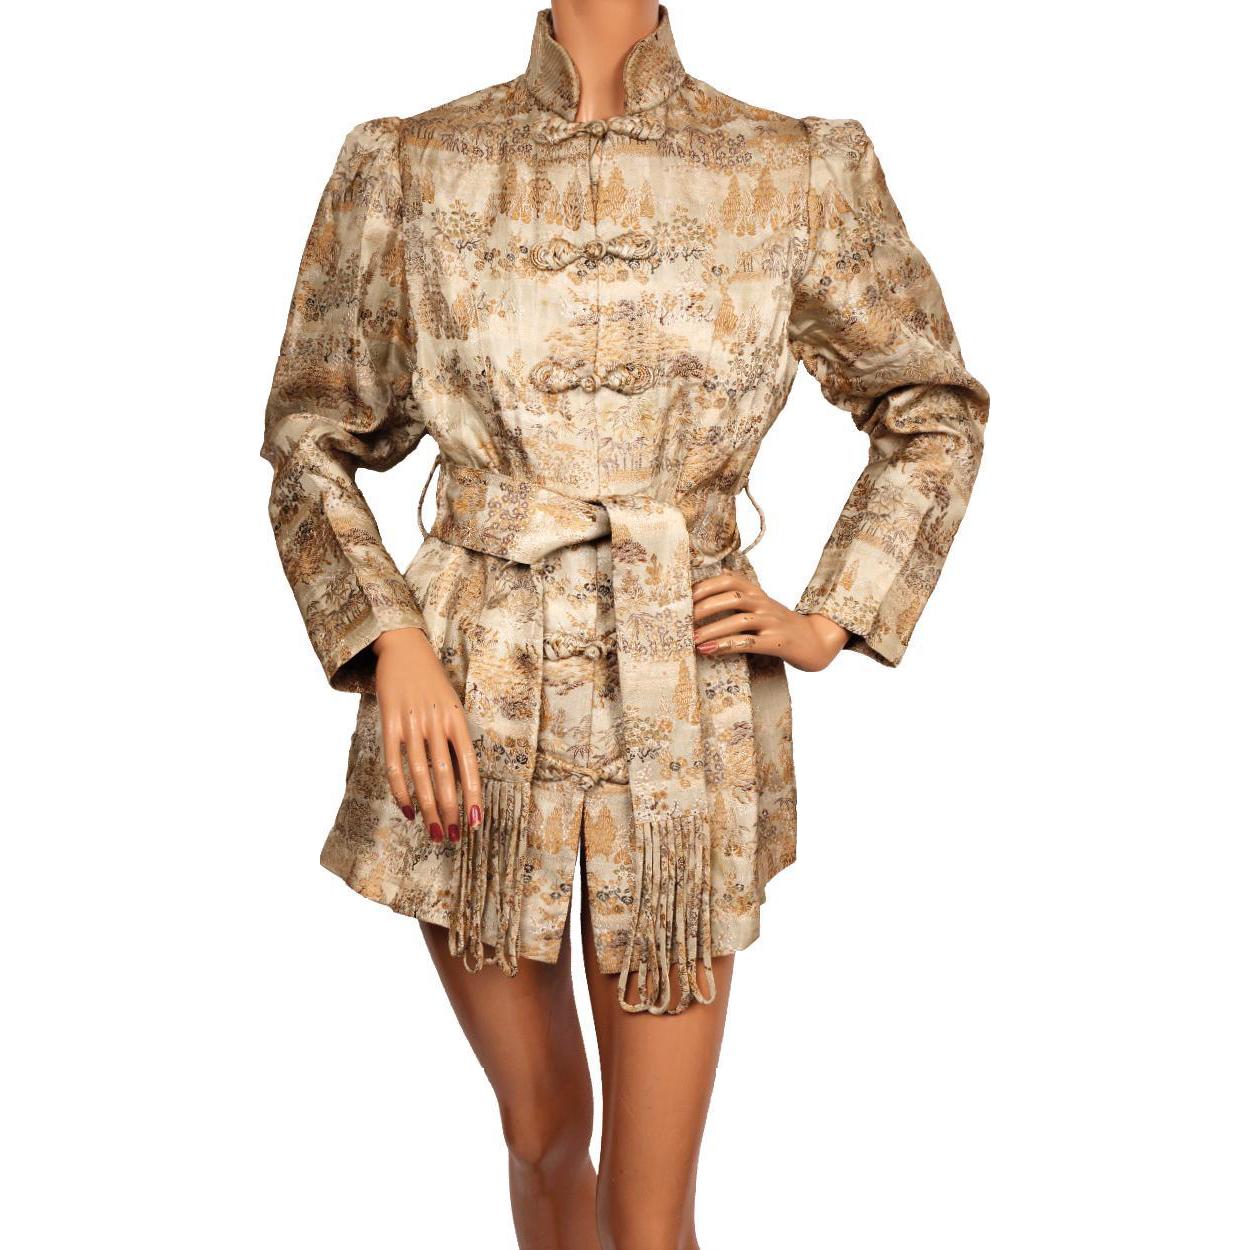 Vintage 1940s Chinese Jacket Woven Silk Brocade Pattern - Medium